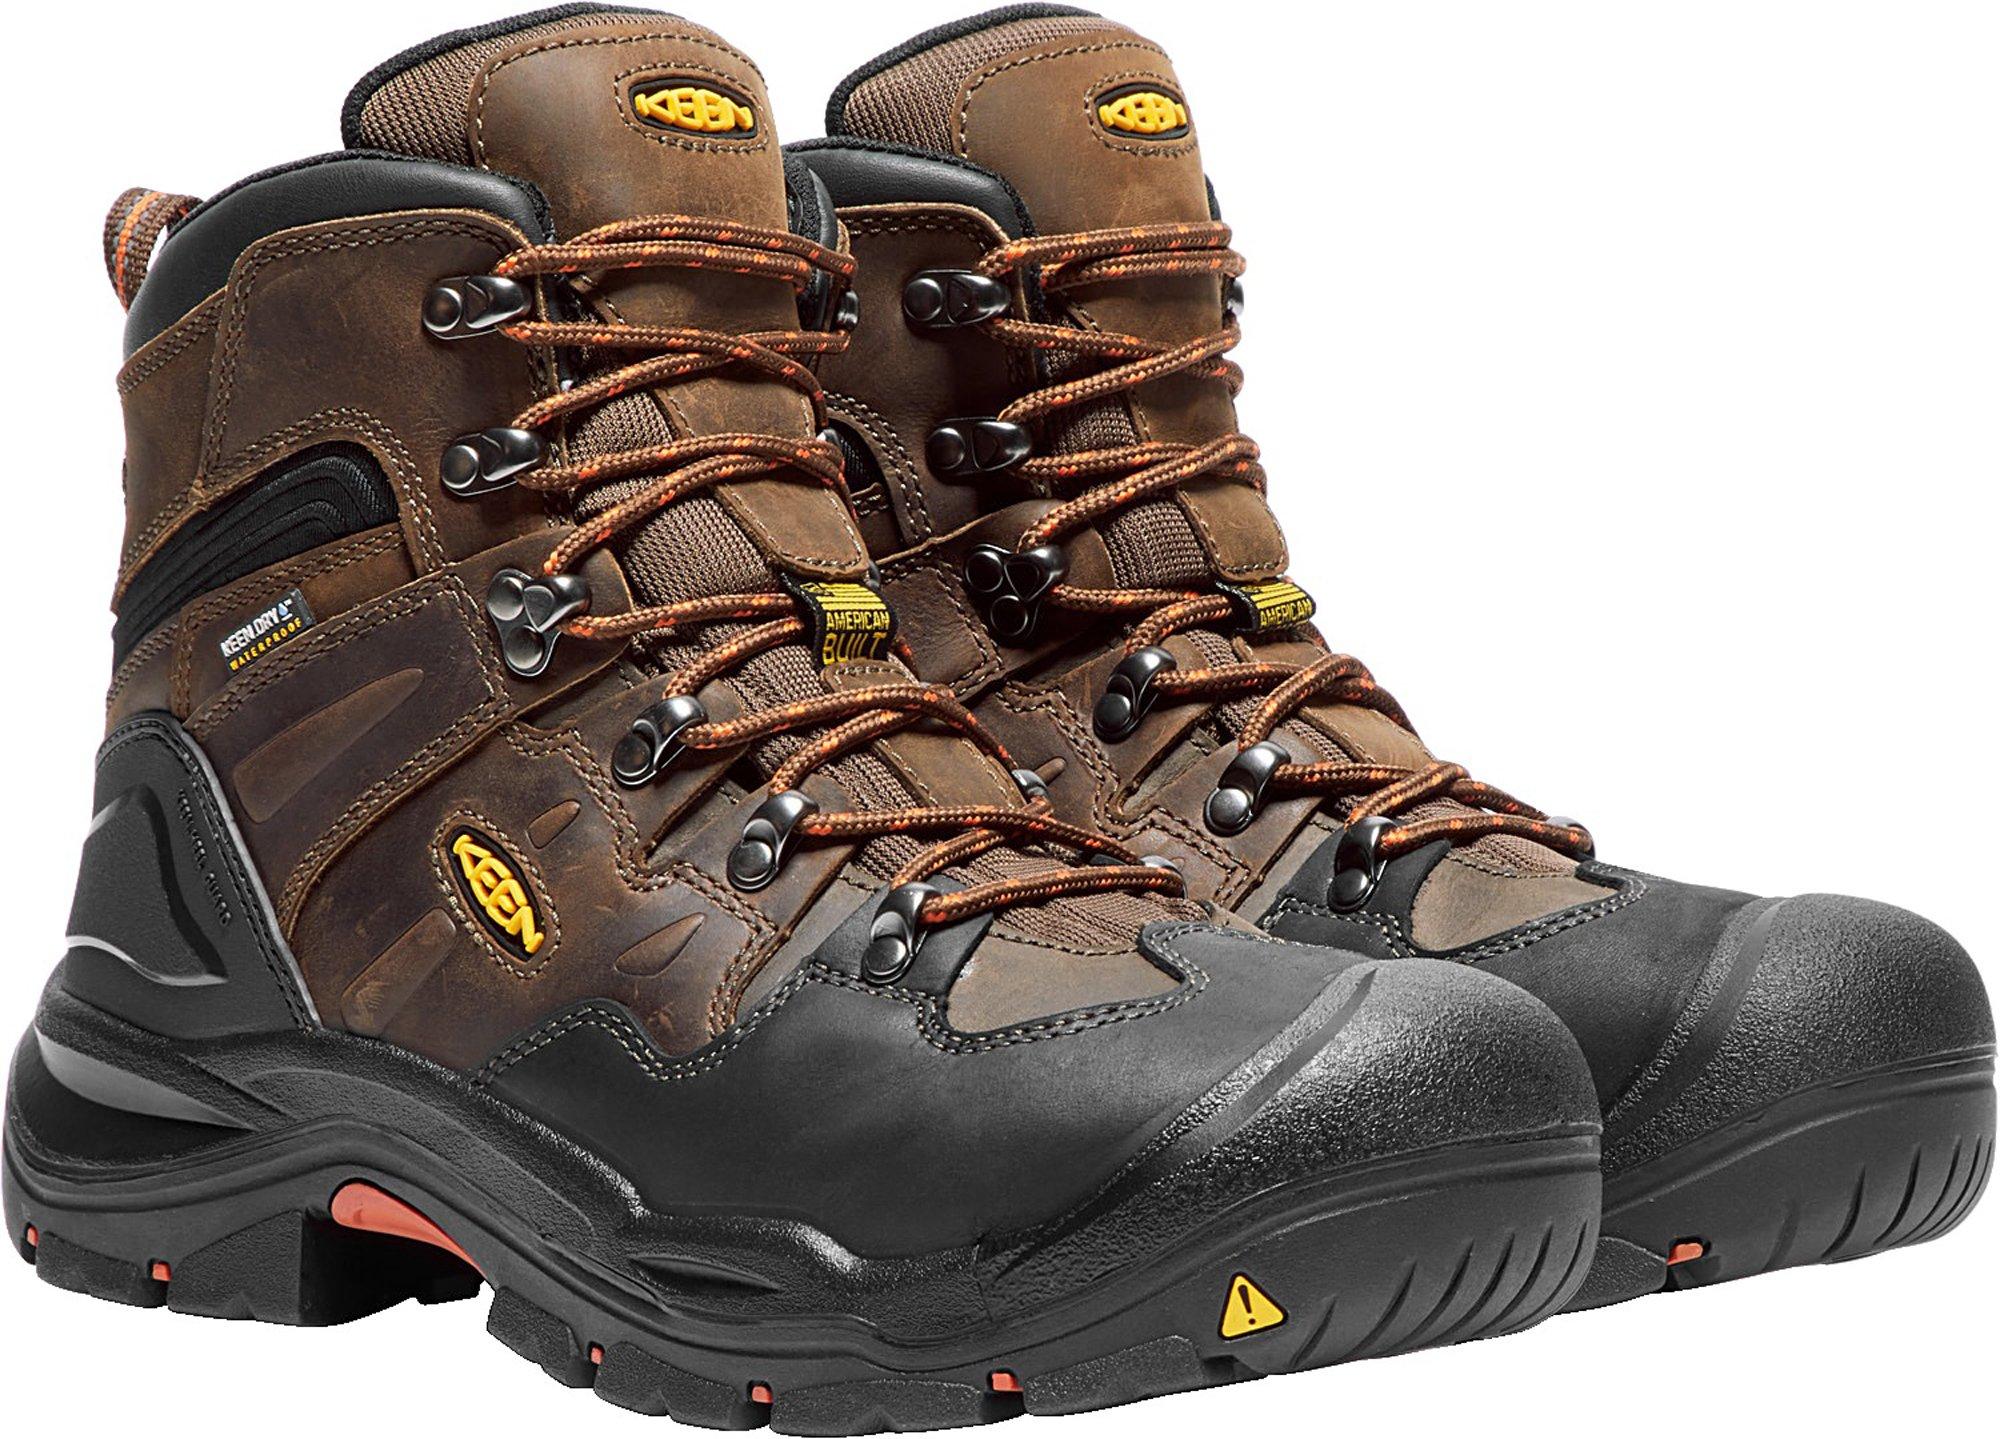 KEEN Utility Coburg 6'' WP (Steel Toe), Men's Work Boot, Cascade Brown/Brindle, 8 EE by KEEN Utility (Image #6)